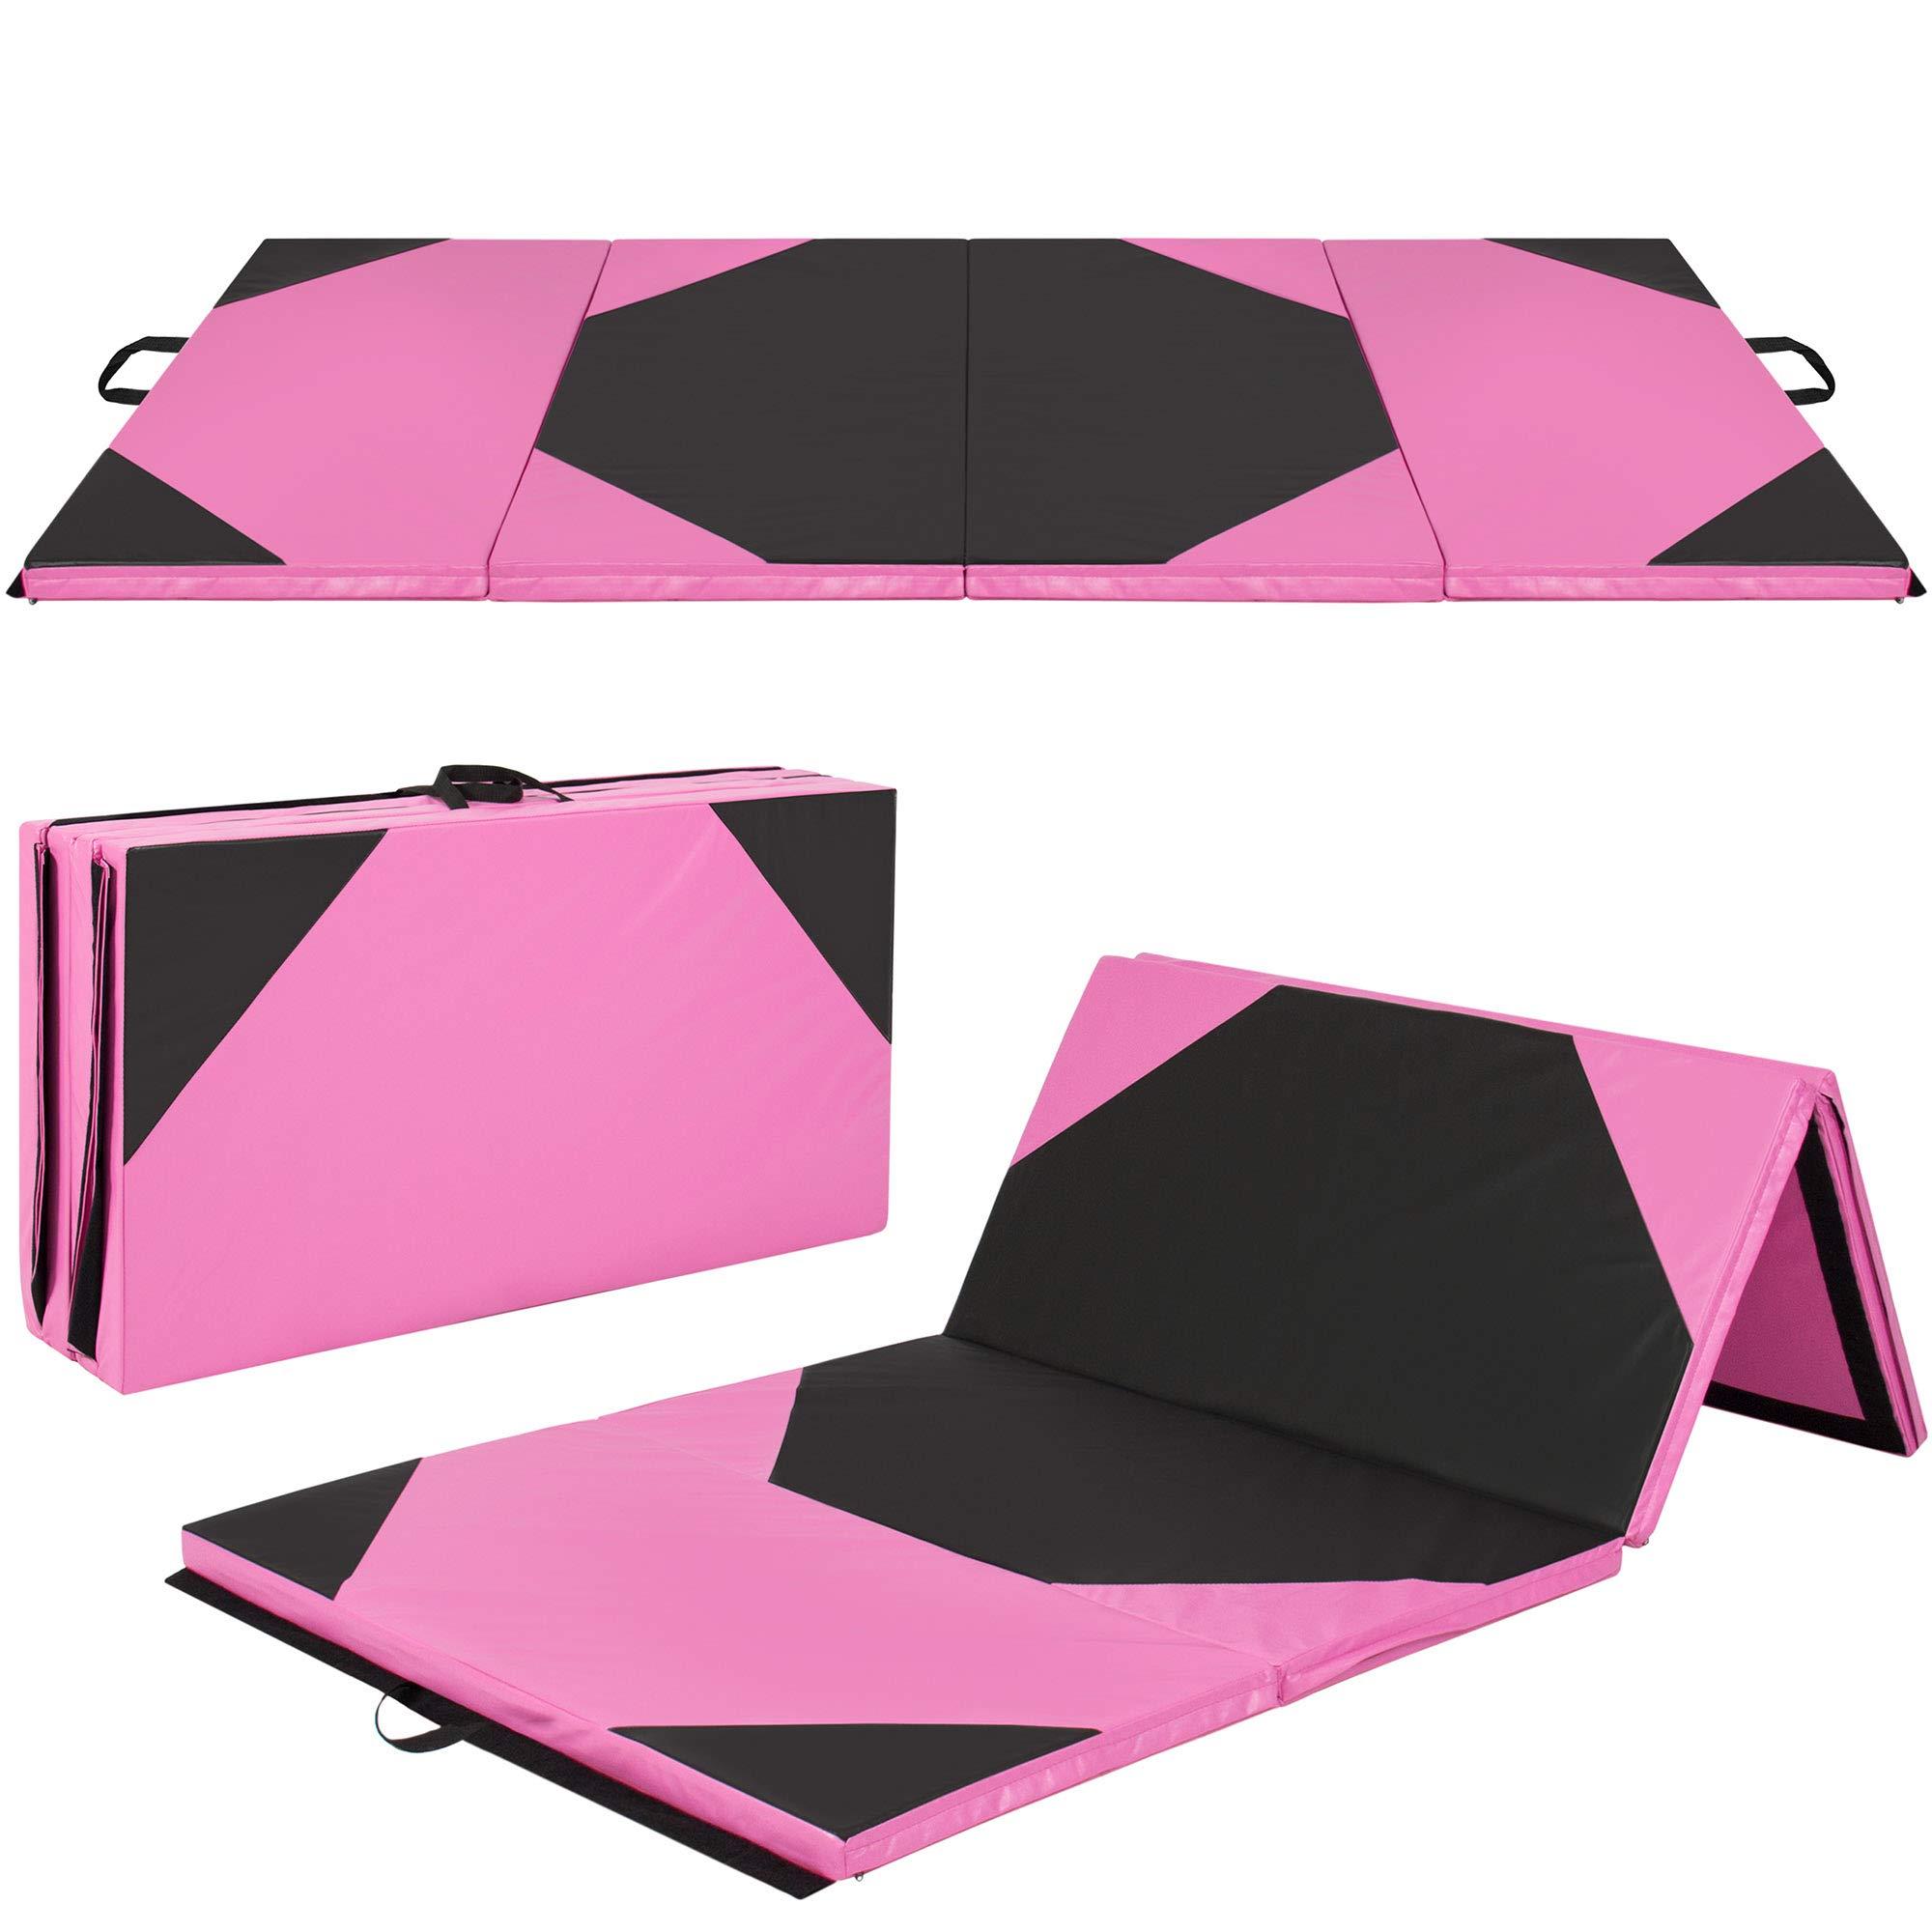 4'x10'x2'' Gymnastics Gym Folding Exercise Aerobics Mats Stretching Yoga Mat, Pink/Black